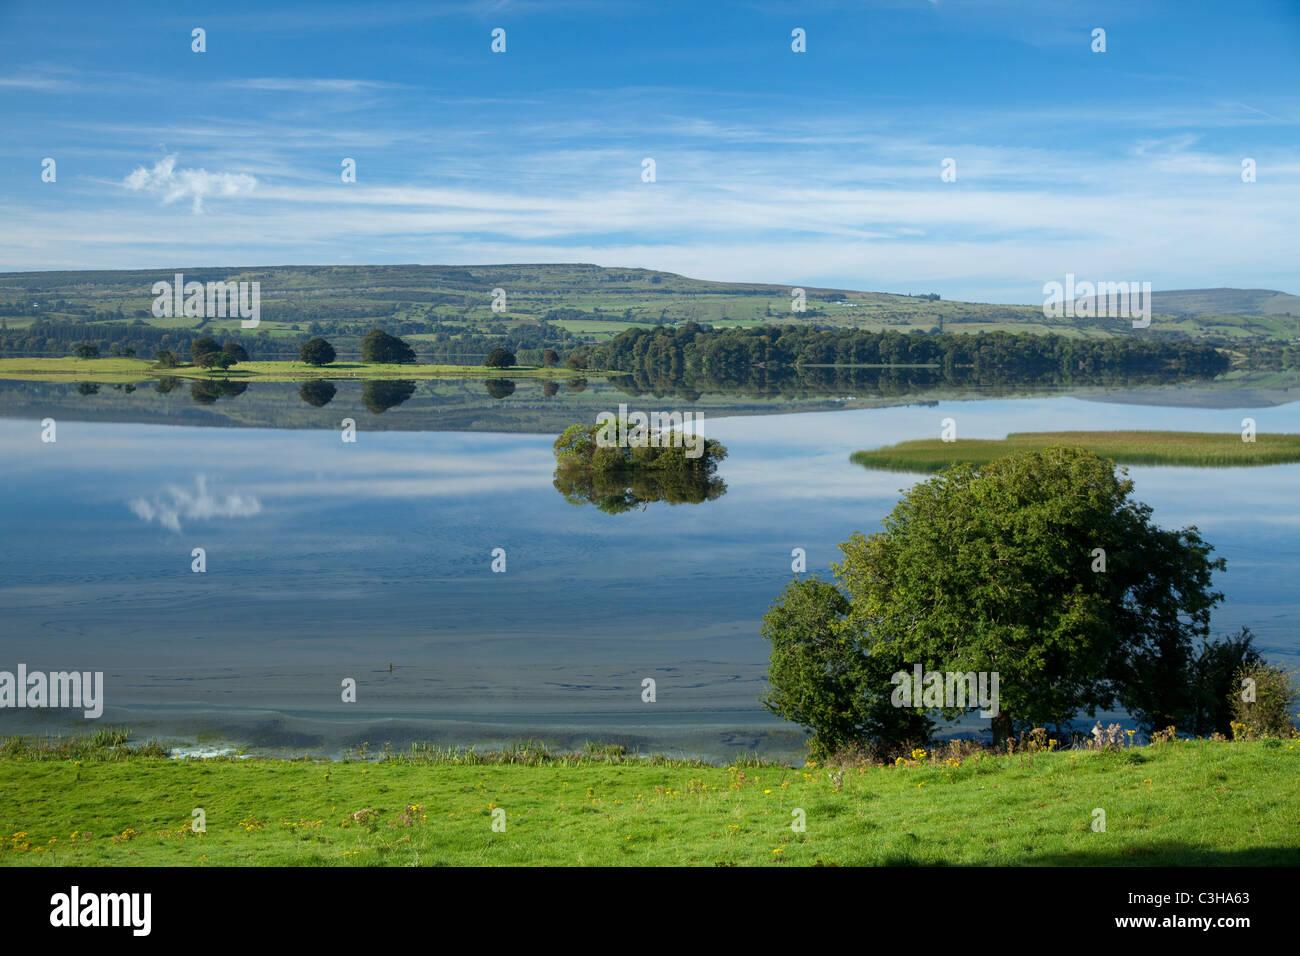 View across Lough Arrow, County Sligo, Ireland. - Stock Image